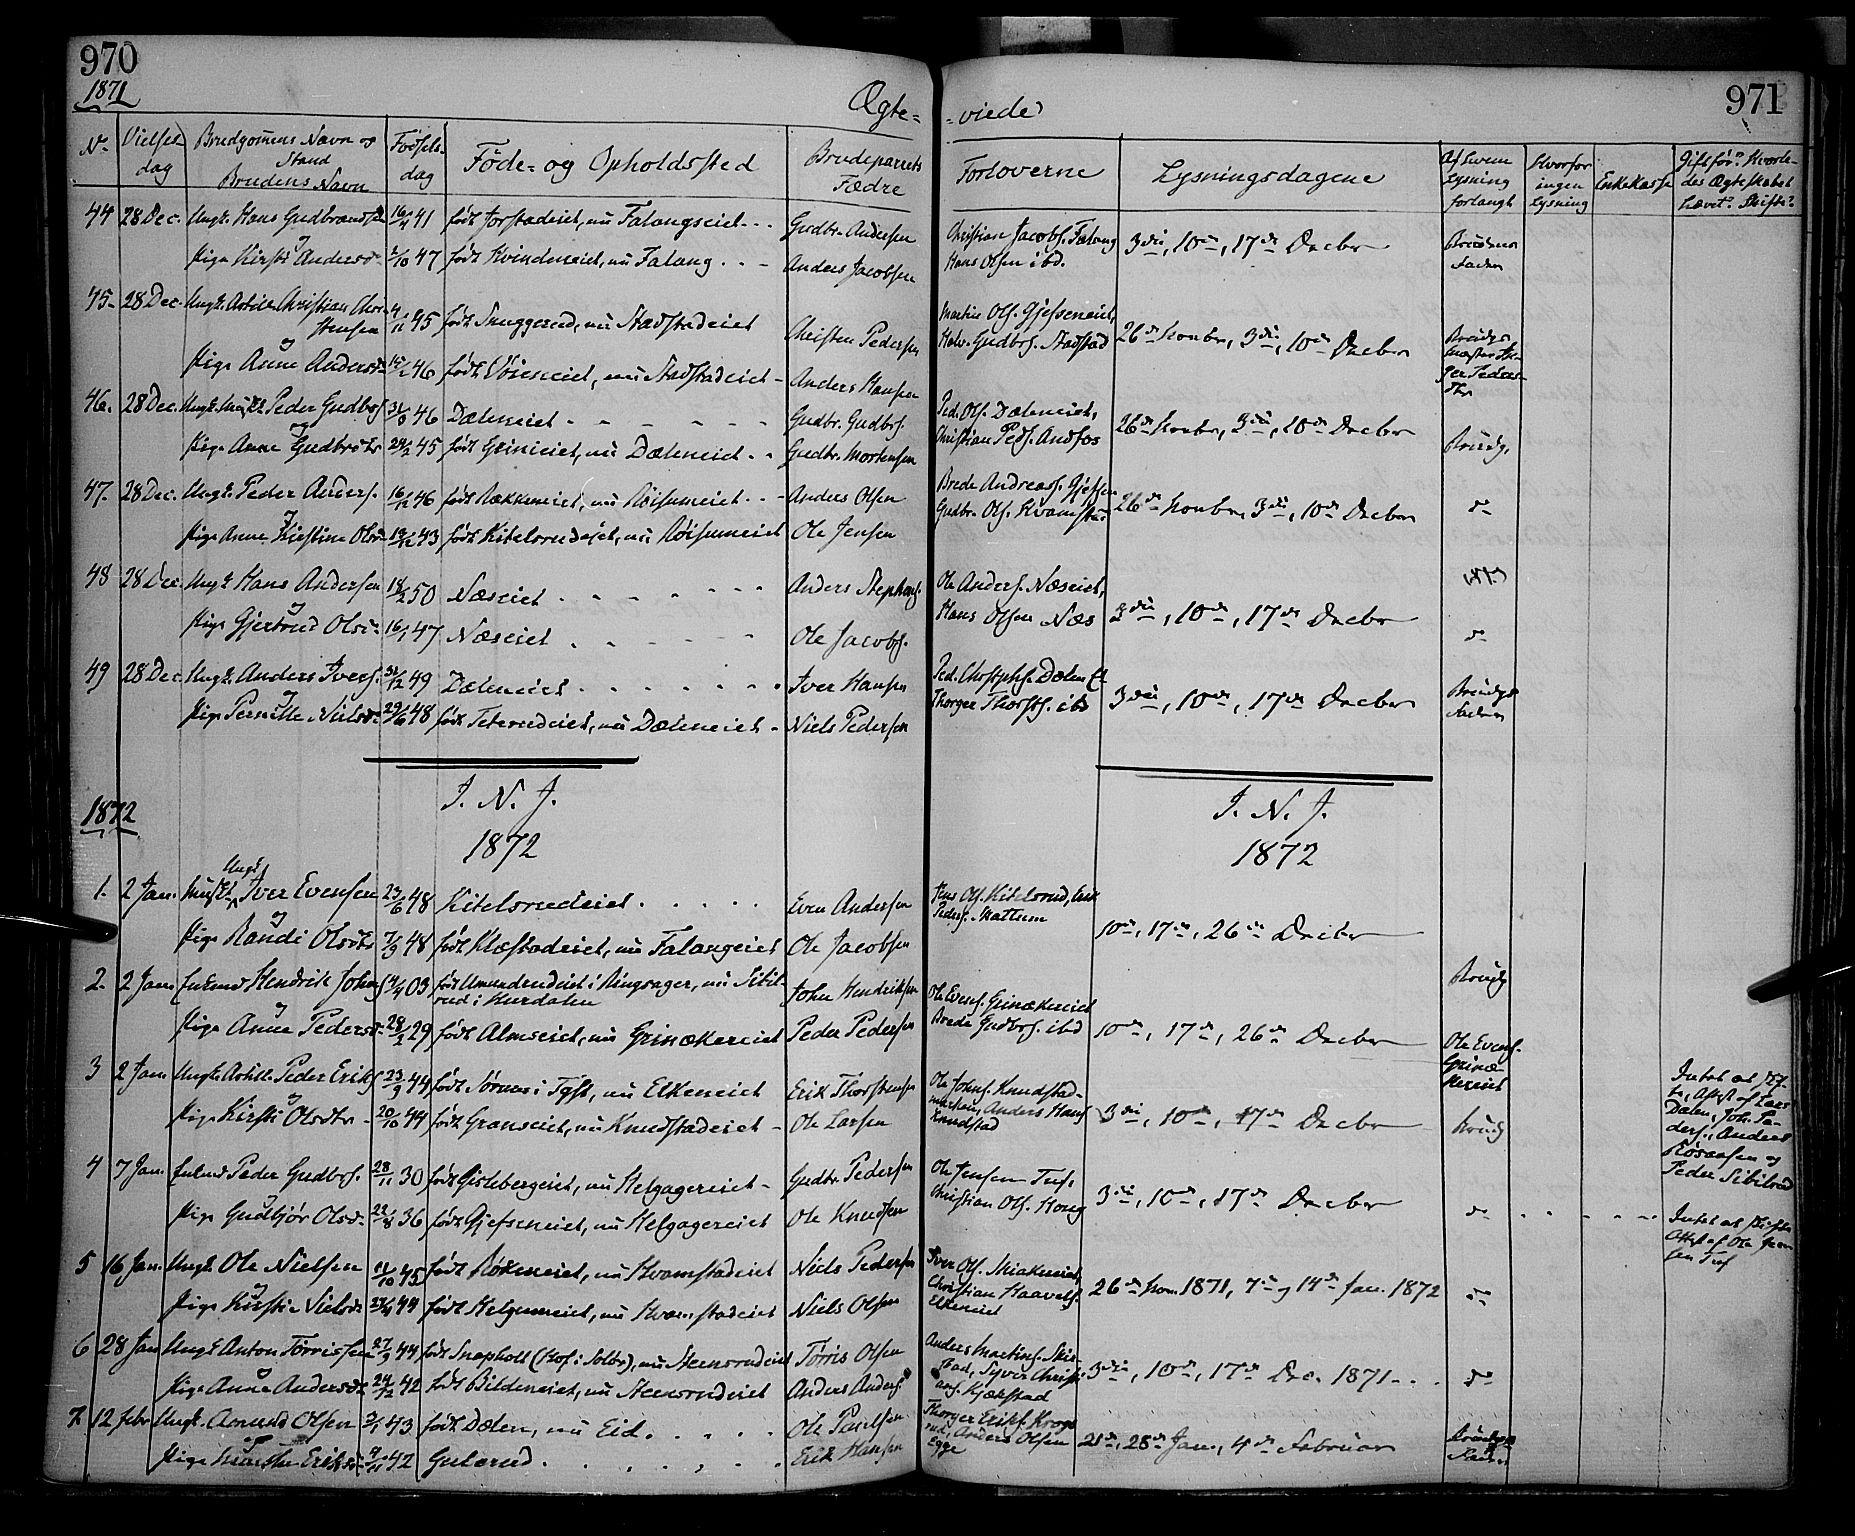 SAH, Gran prestekontor, Ministerialbok nr. 12, 1856-1874, s. 970-971